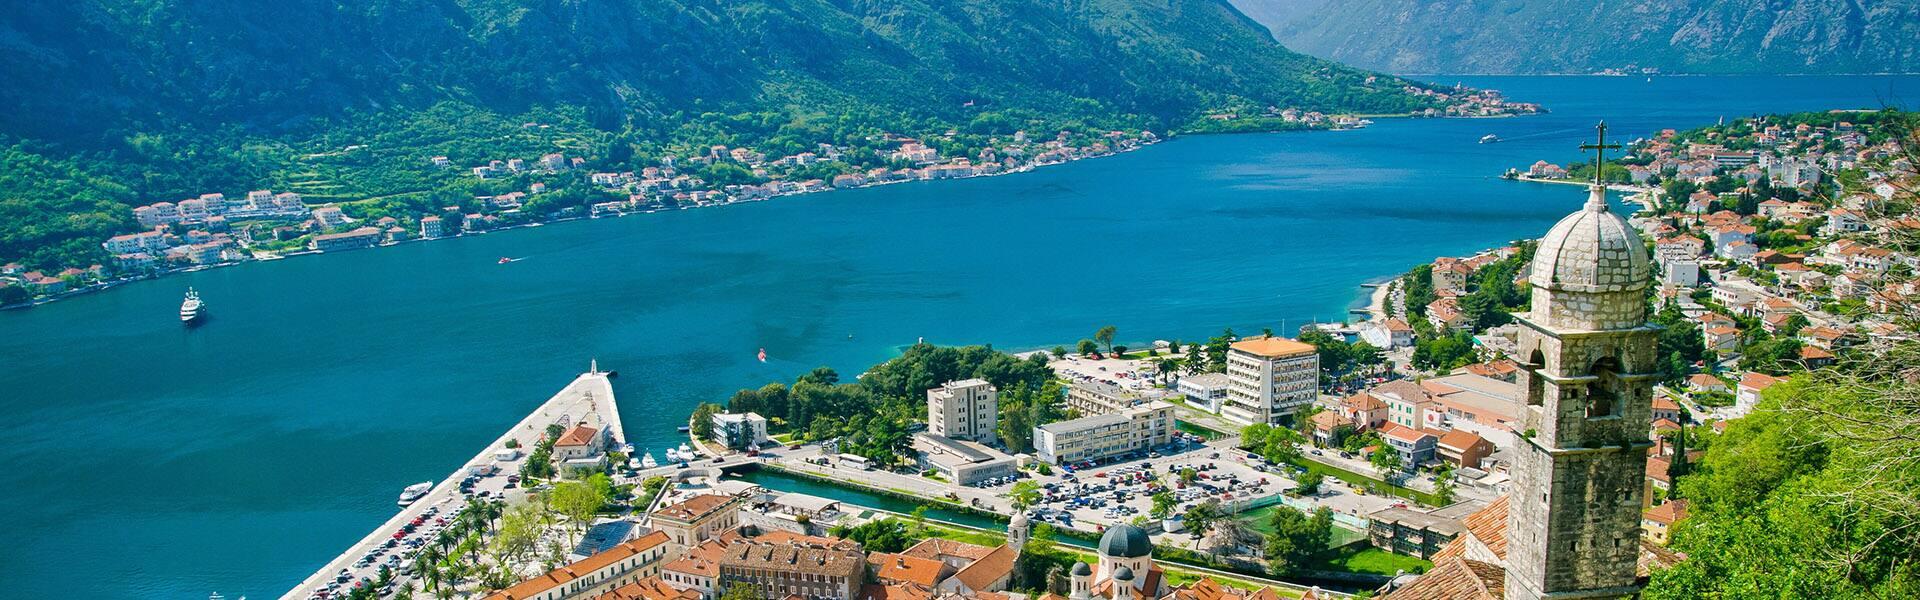 Mediterraneo: Napoli e Santorini